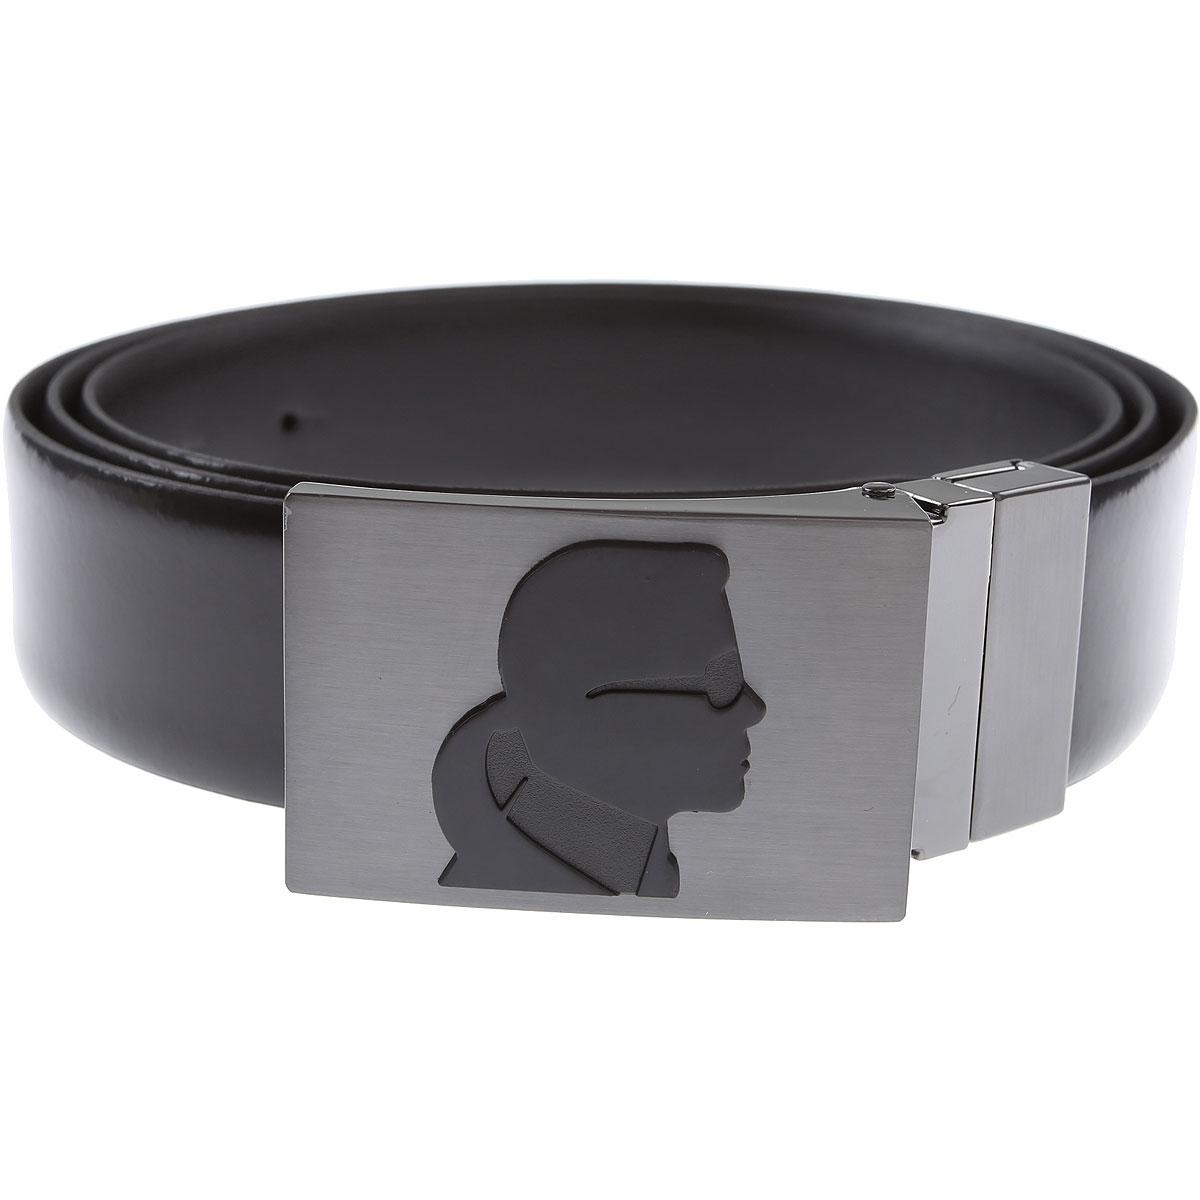 Karl Lagerfeld Belts On Sale, Black, Leather, 2019